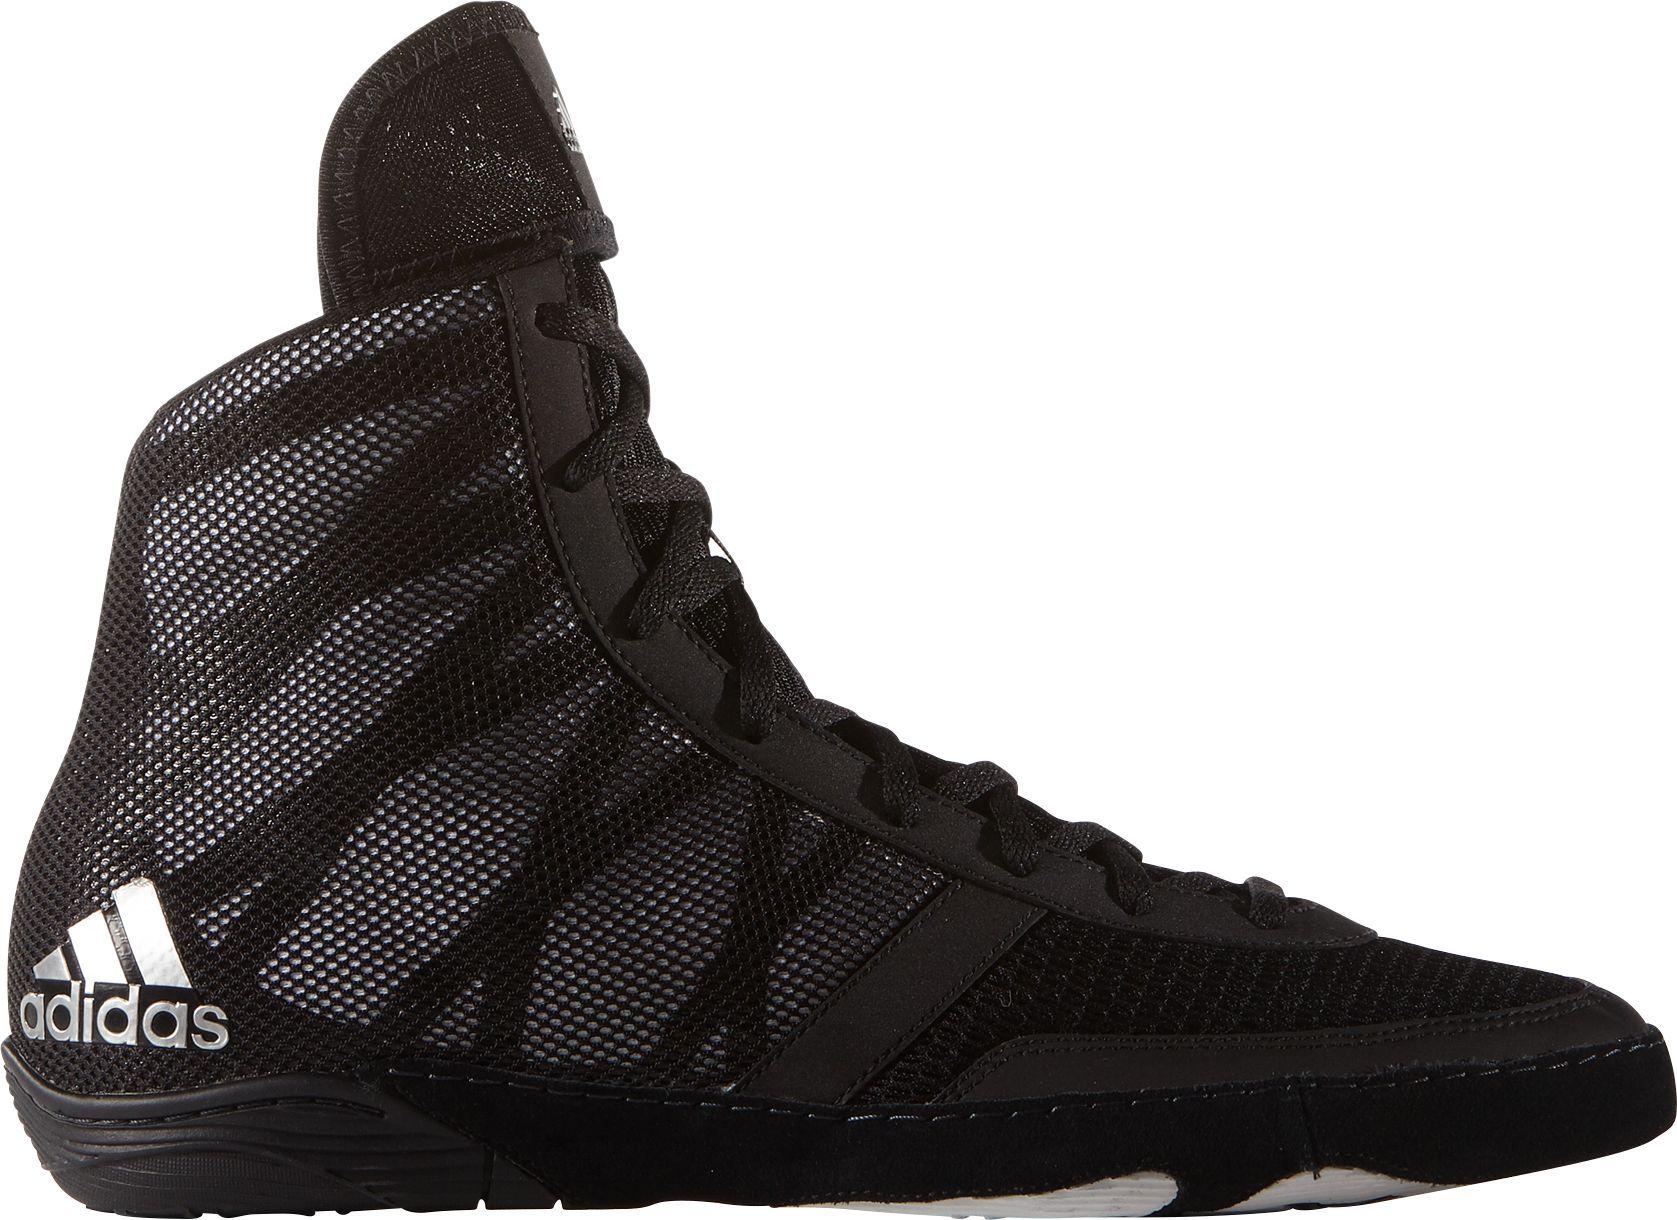 af68ac185d2 adidas Men s Pretereo III Wrestling Shoes